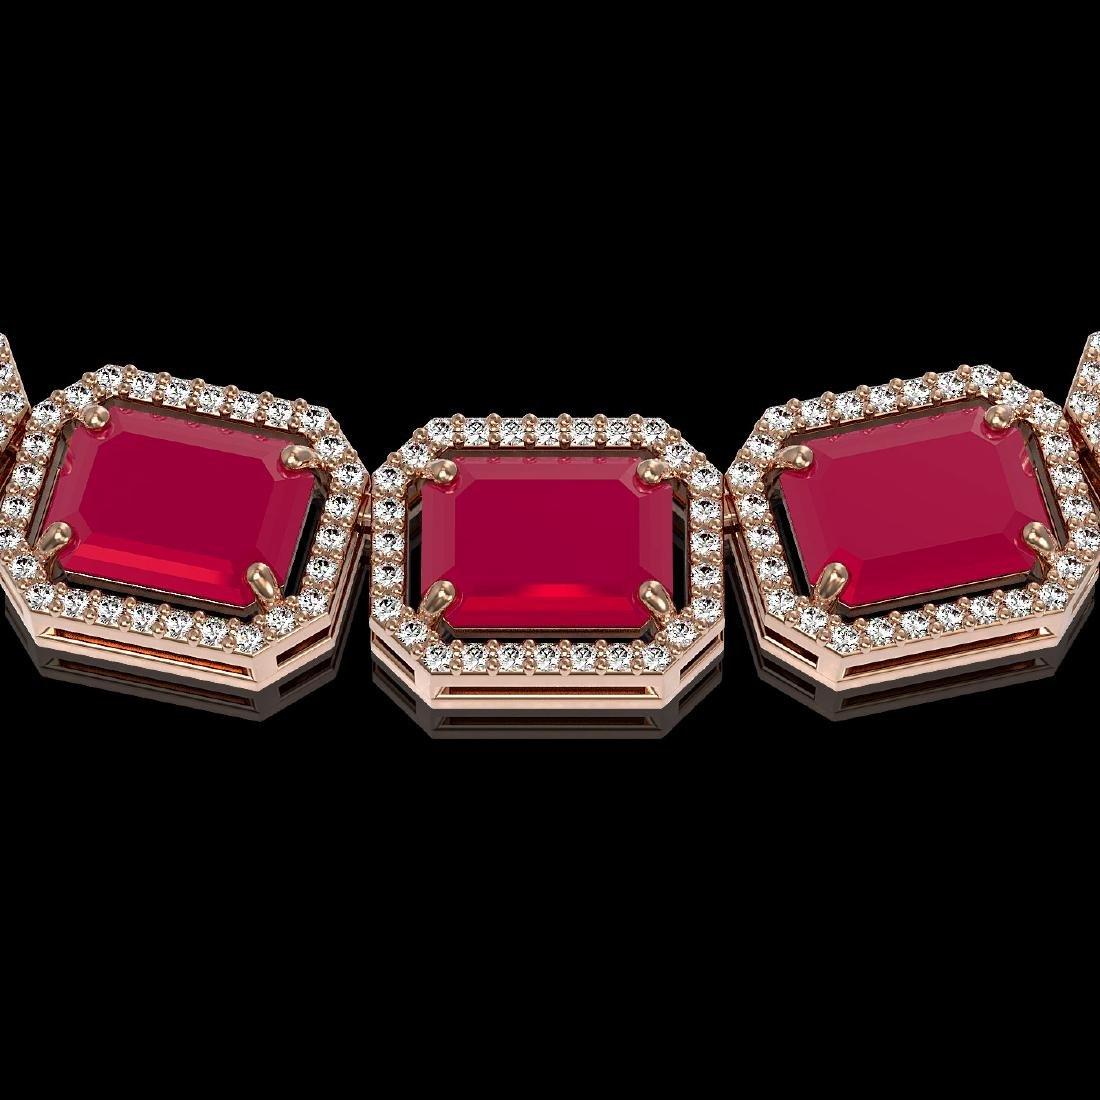 84.94 CTW Ruby & Diamond Halo Necklace 10K Rose Gold - 3